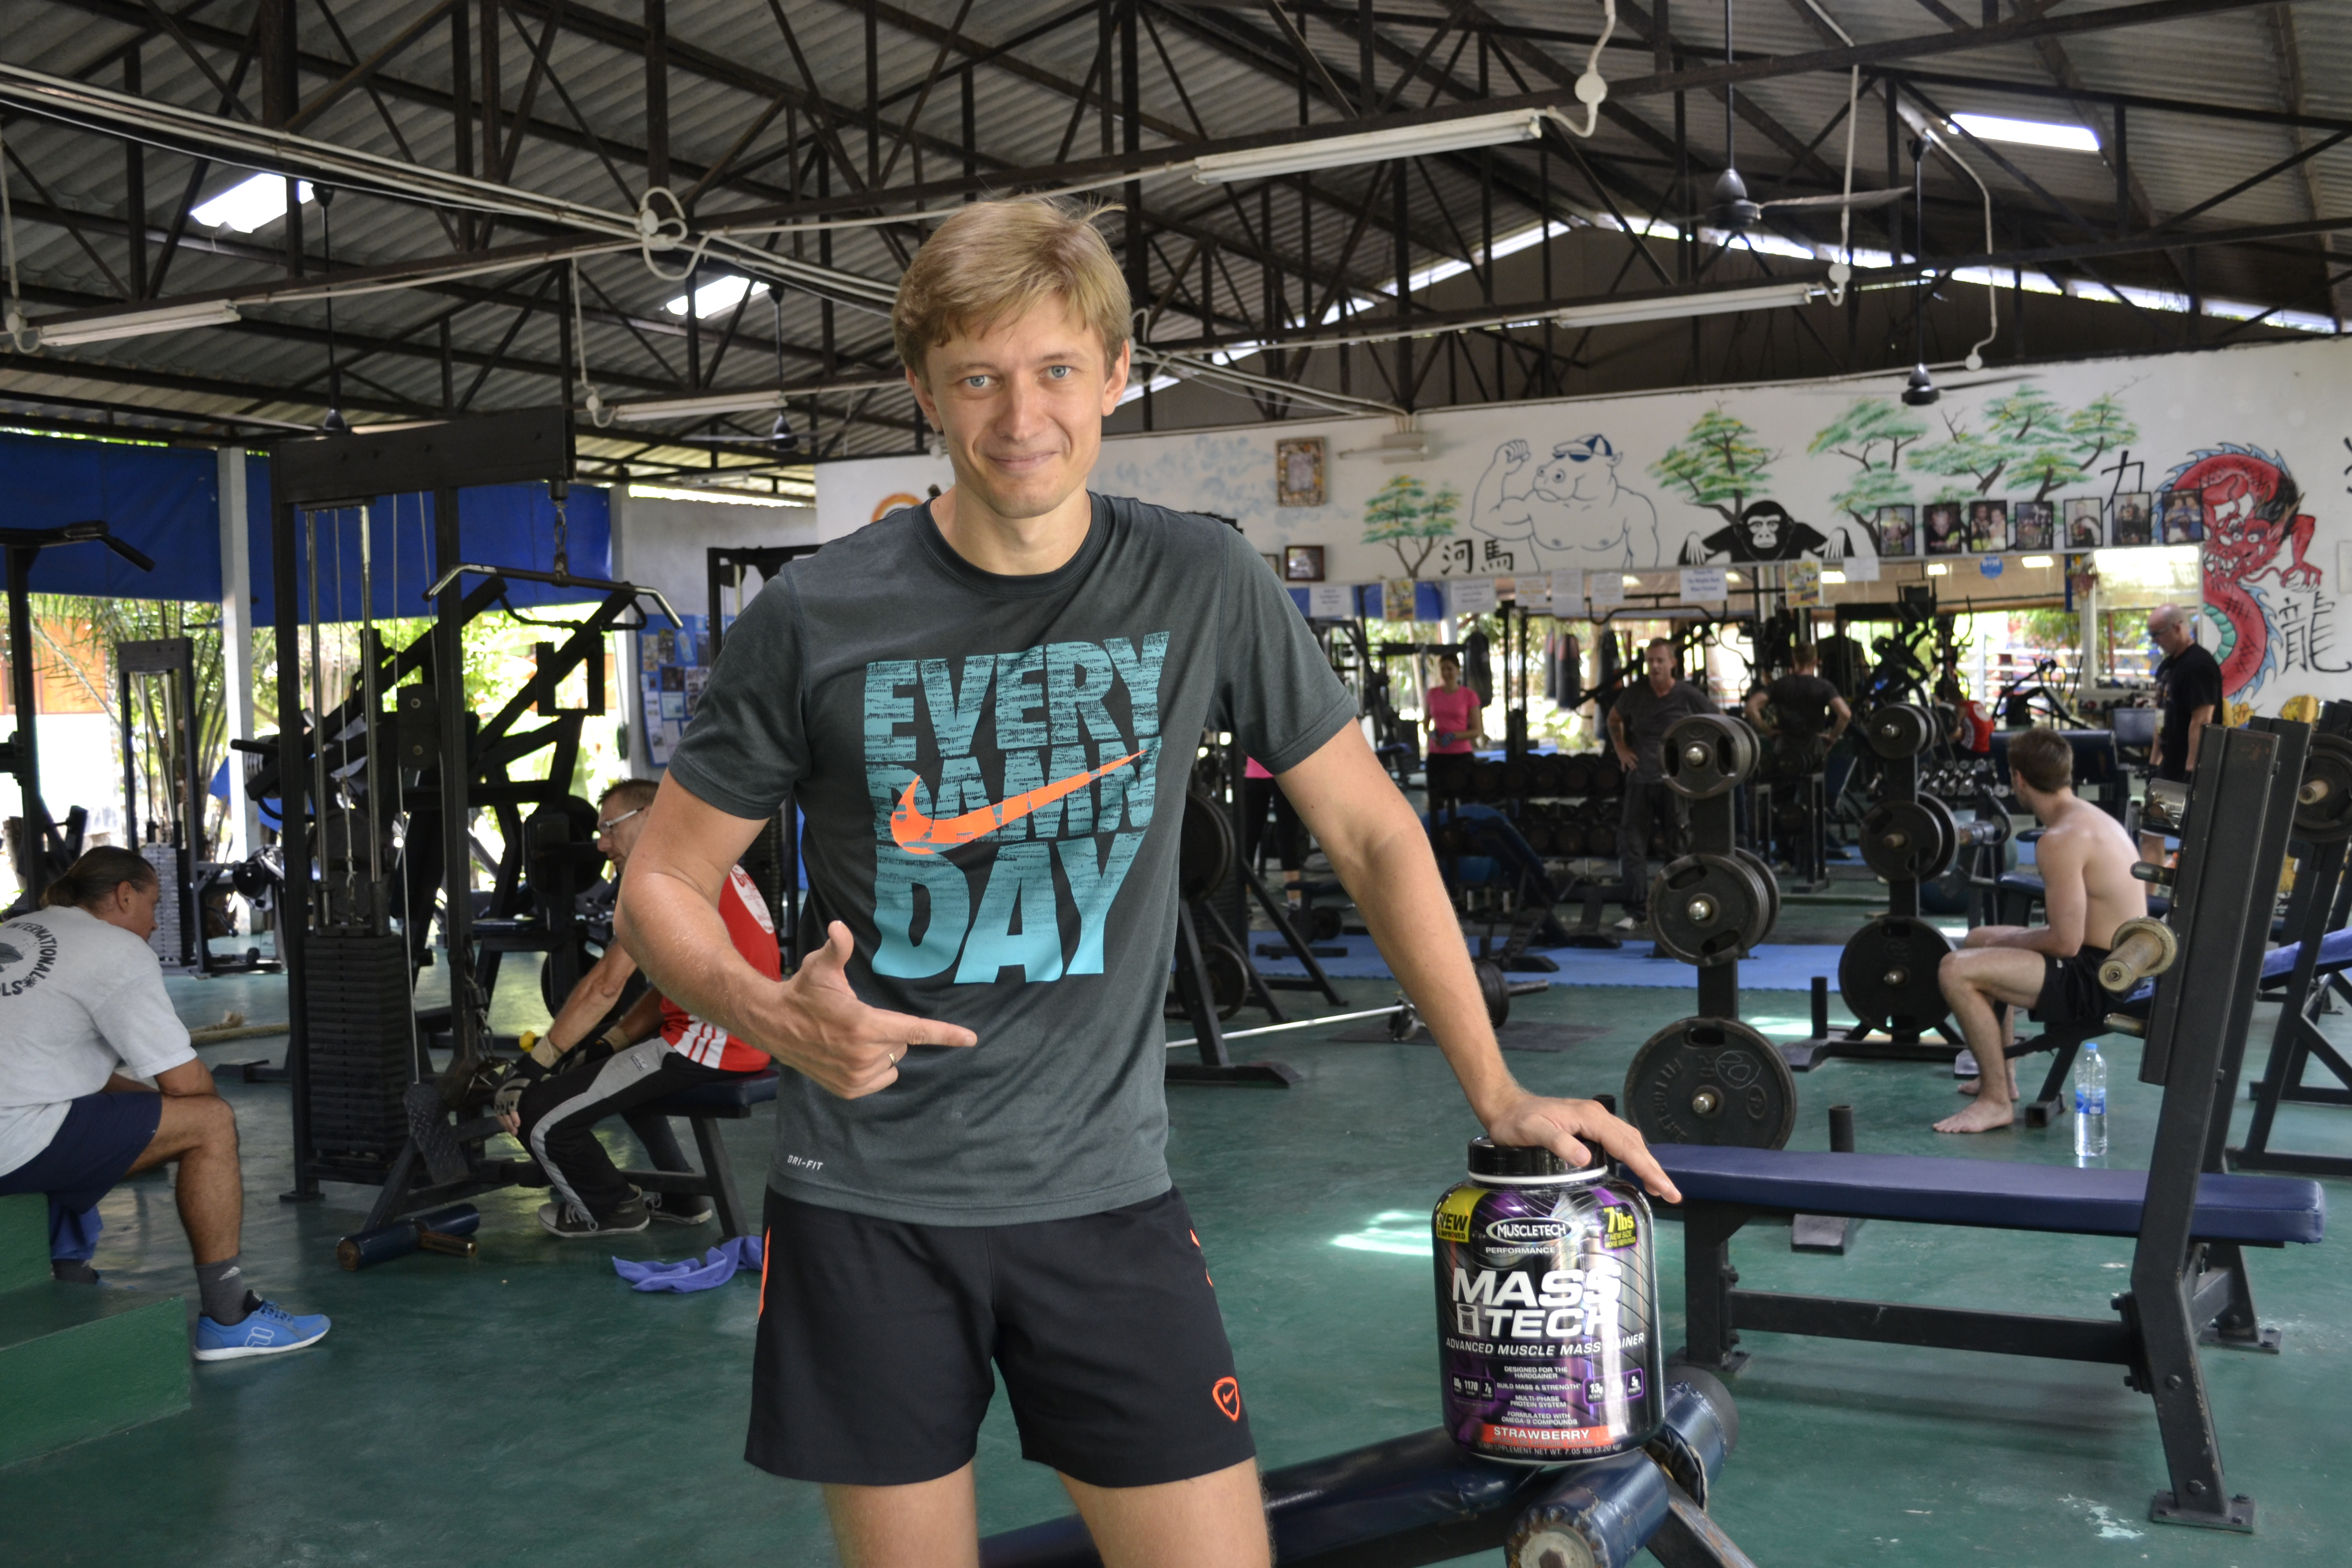 Artem-Mel'nik-Fitnes-proekt-10-aja-nedelja-zanjatij-sportom-Артем-Мельник-Фитнес-проект-10-ая-неделя-занятий-спортом